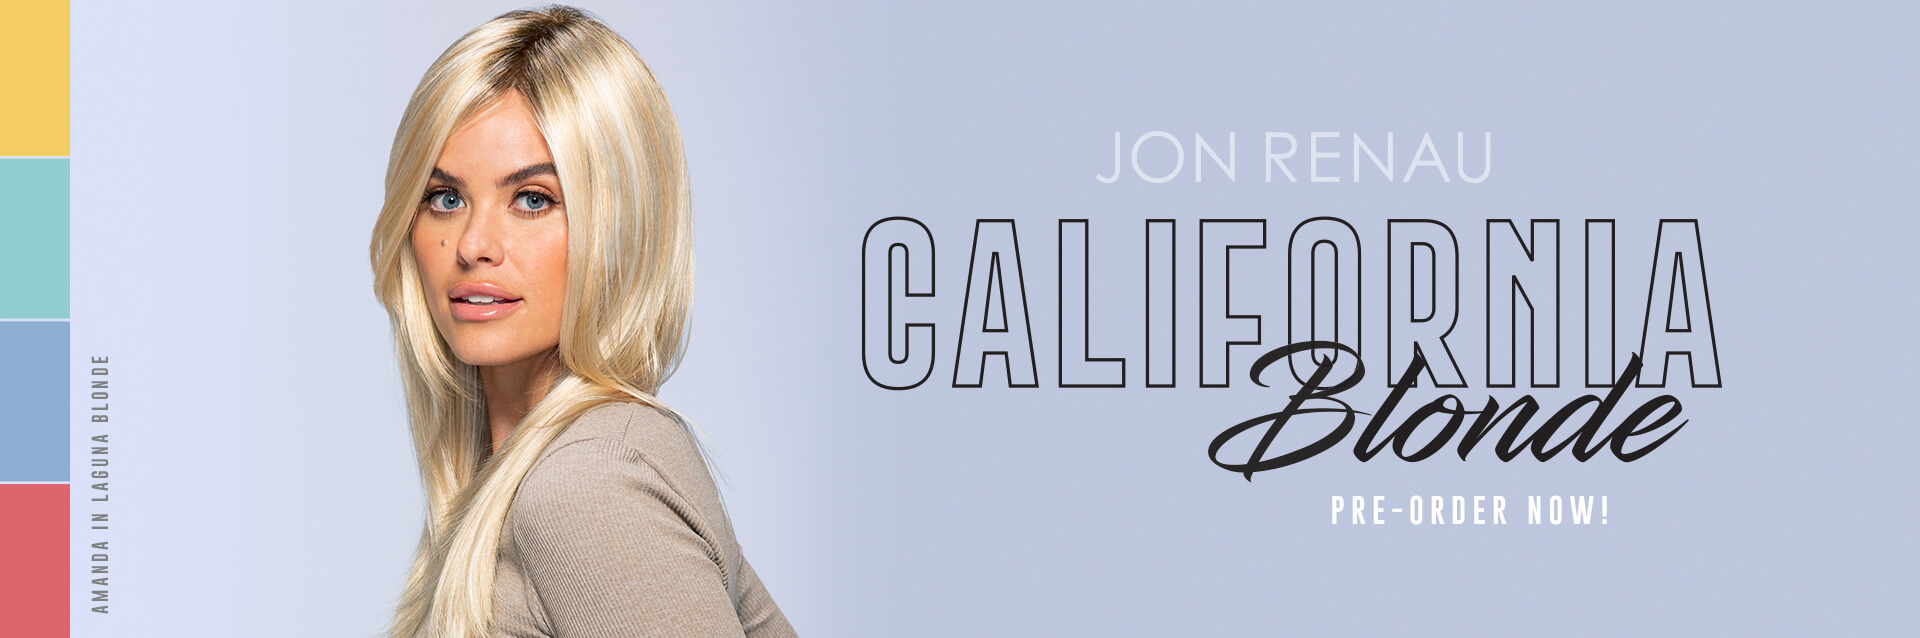 New Jon Renau California Blonde 2021